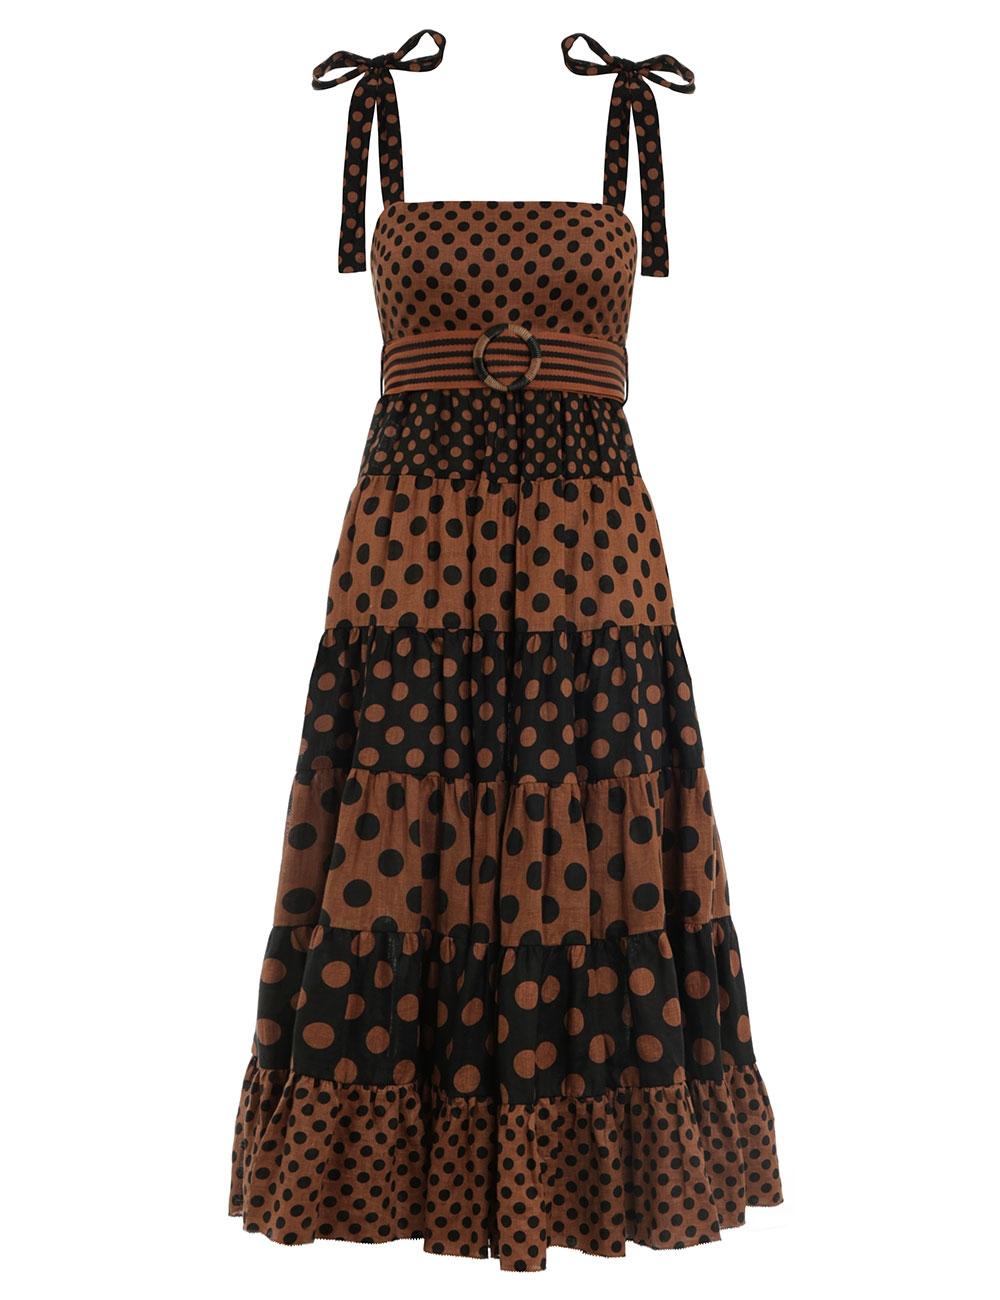 Juno Panelled Tie Dress